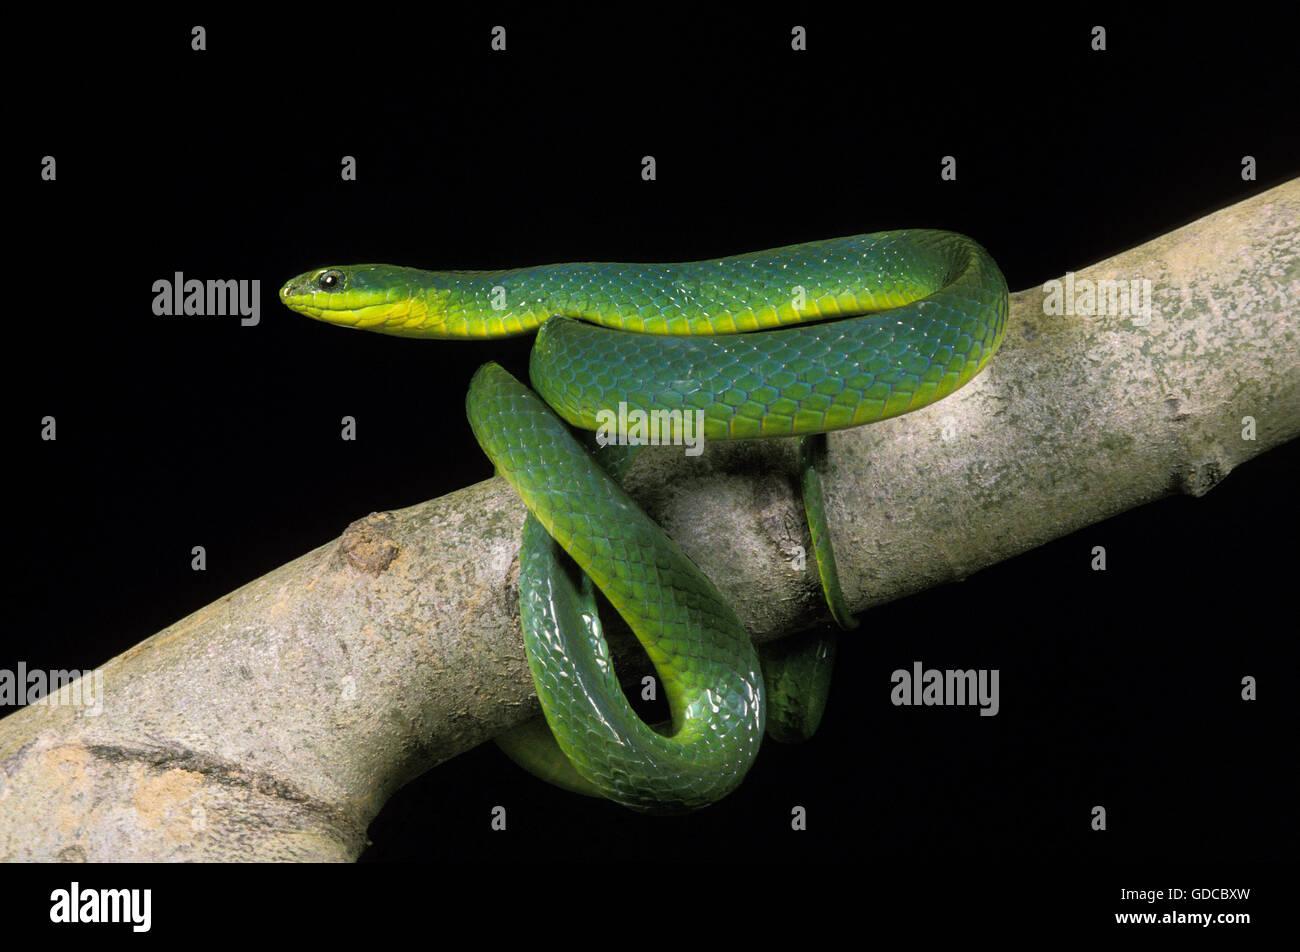 Green Snake, opheodrys major against Black Background - Stock Image